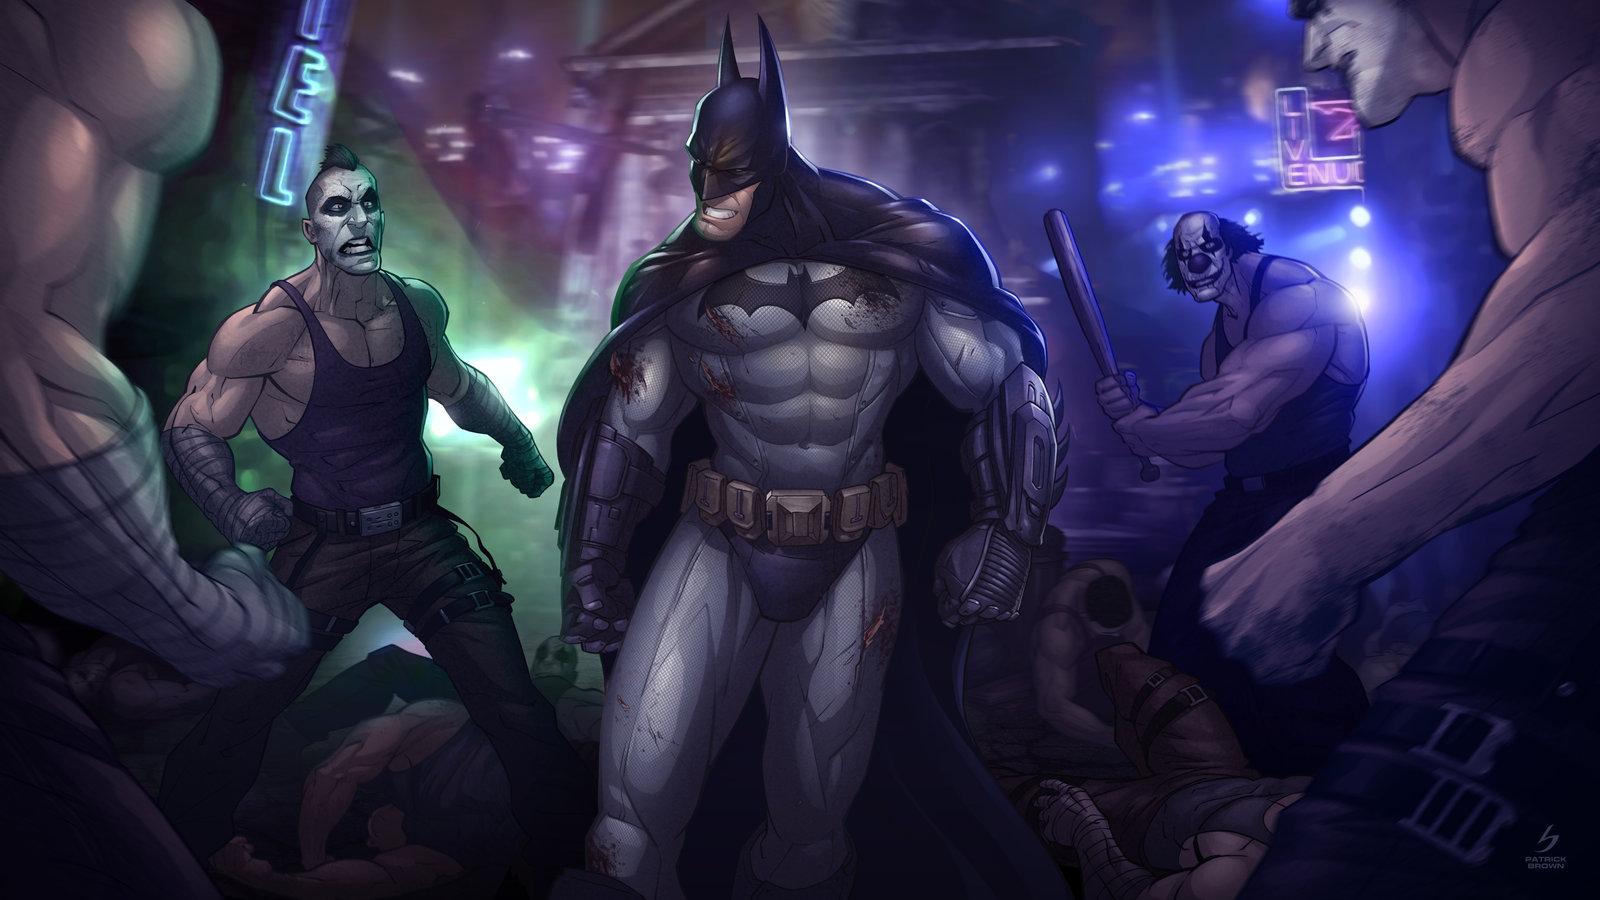 batman arkham city by patrickbrown fan art digital art drawings games 1600x900